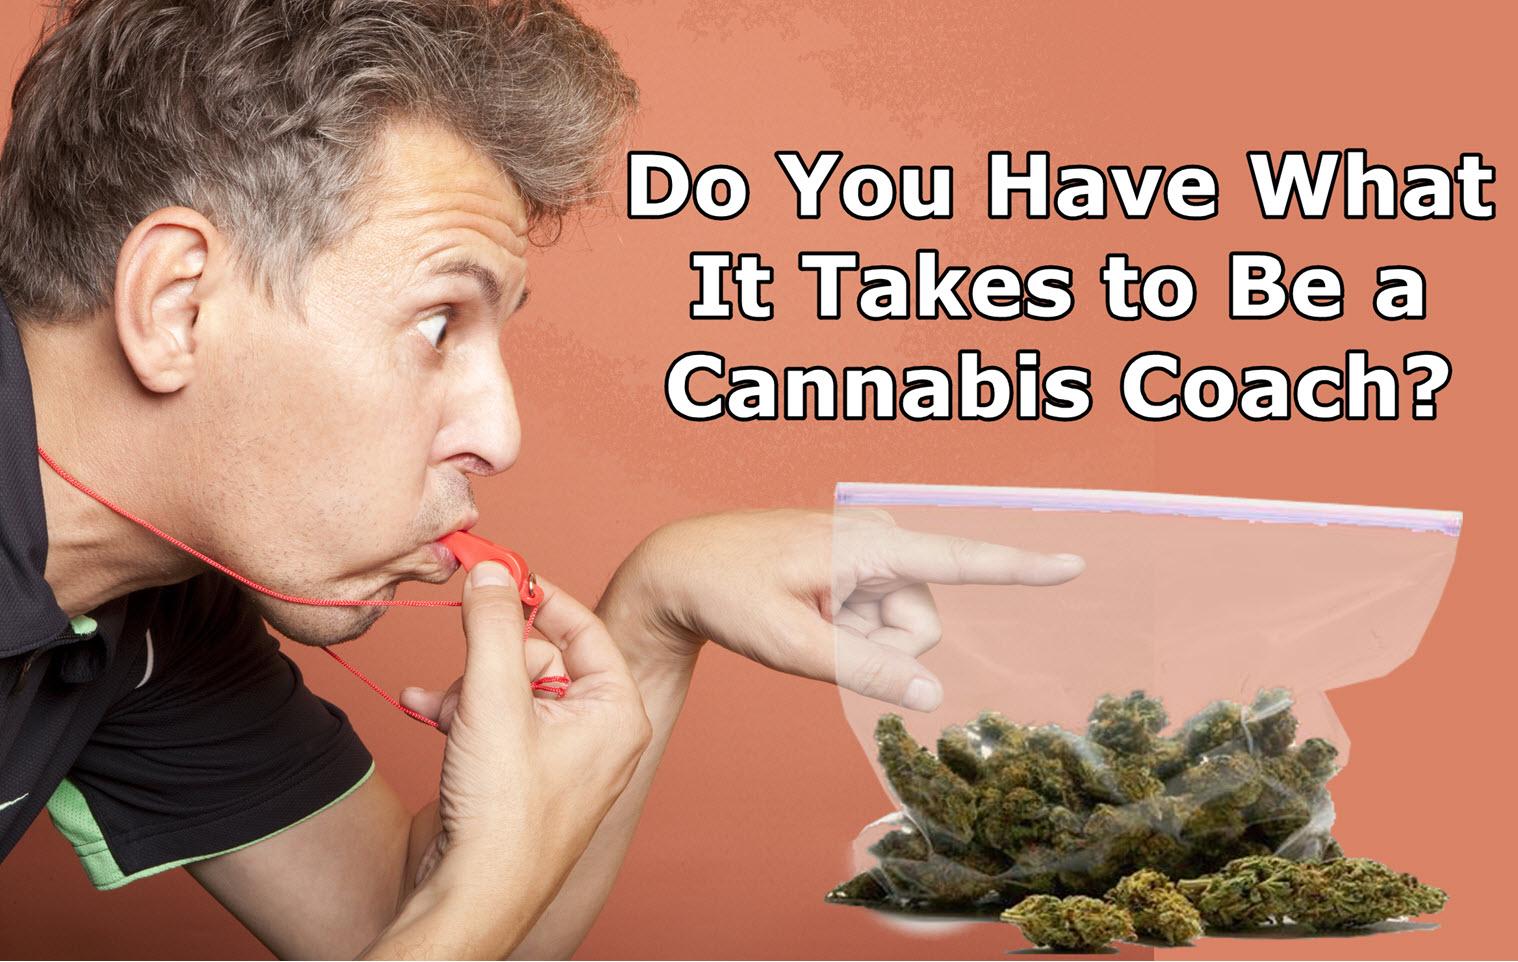 Cannabis Coaching - Teaching People to Smoke Weed (Yes, It